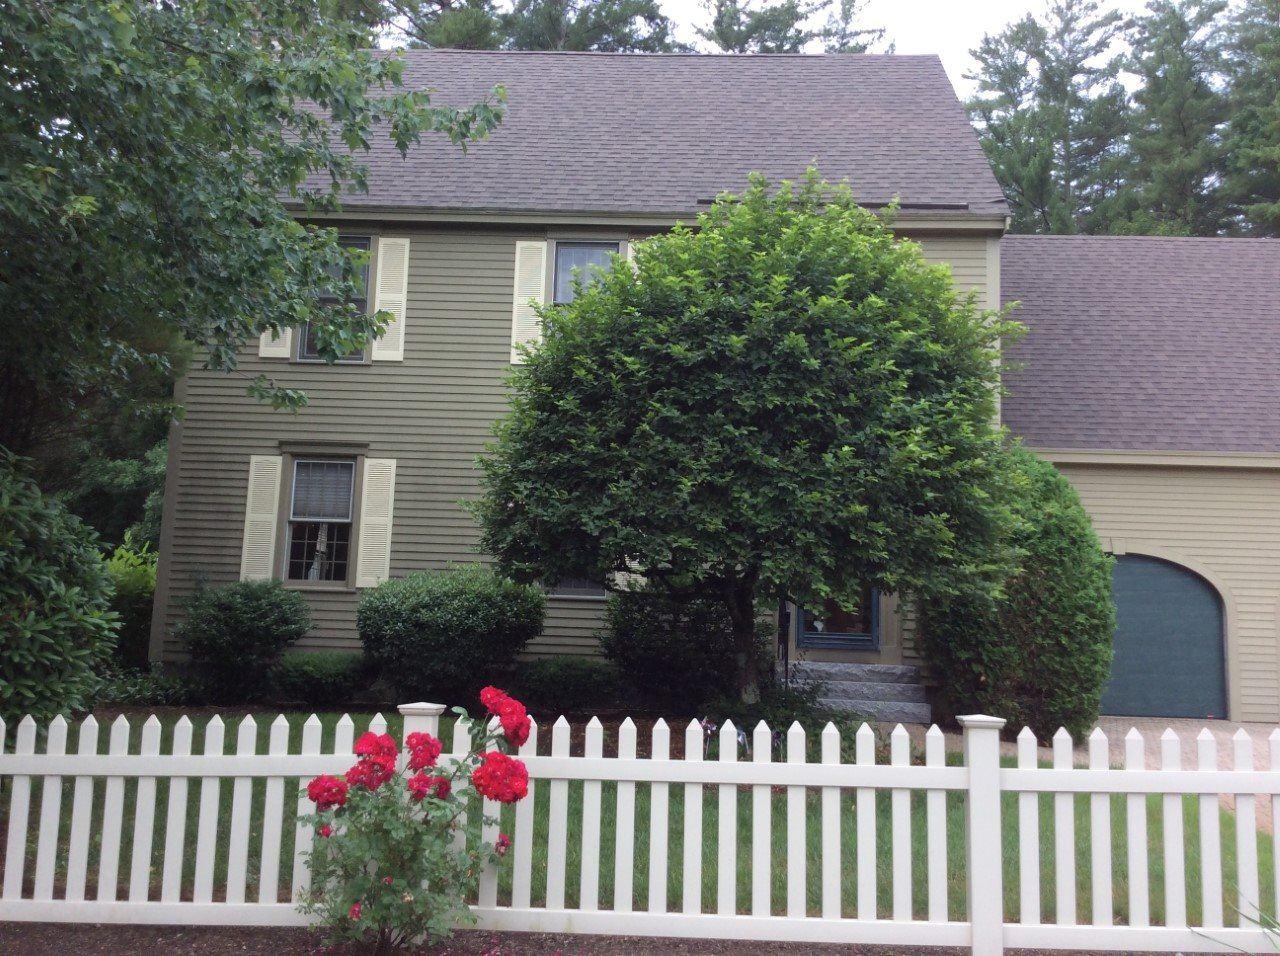 24 Lamplight Drive, Atkinson, NH 03811 - MLS#: 4798121